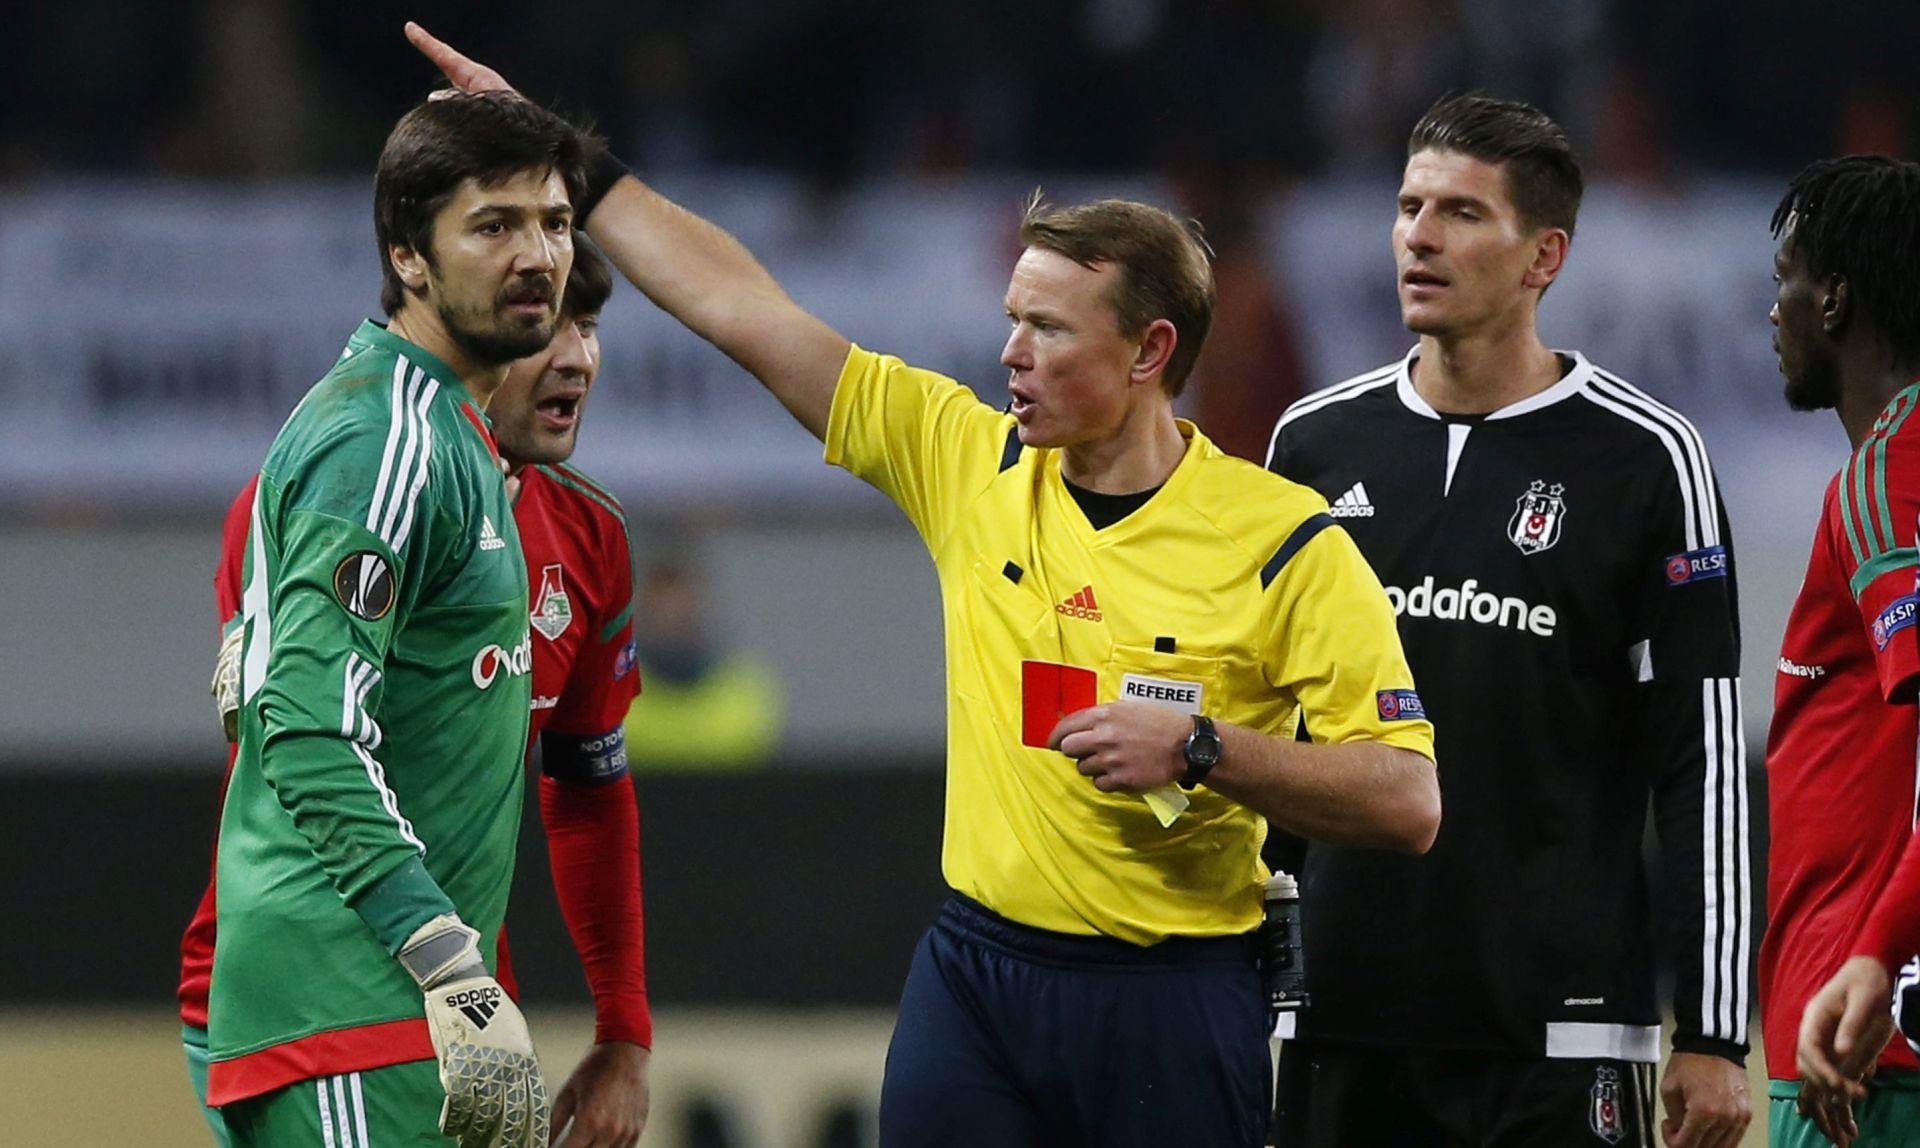 EUROPA LIGA Poraz Fiorentine, pobjeda Monaca, Rebić i Ćorluka dobili crvene karton